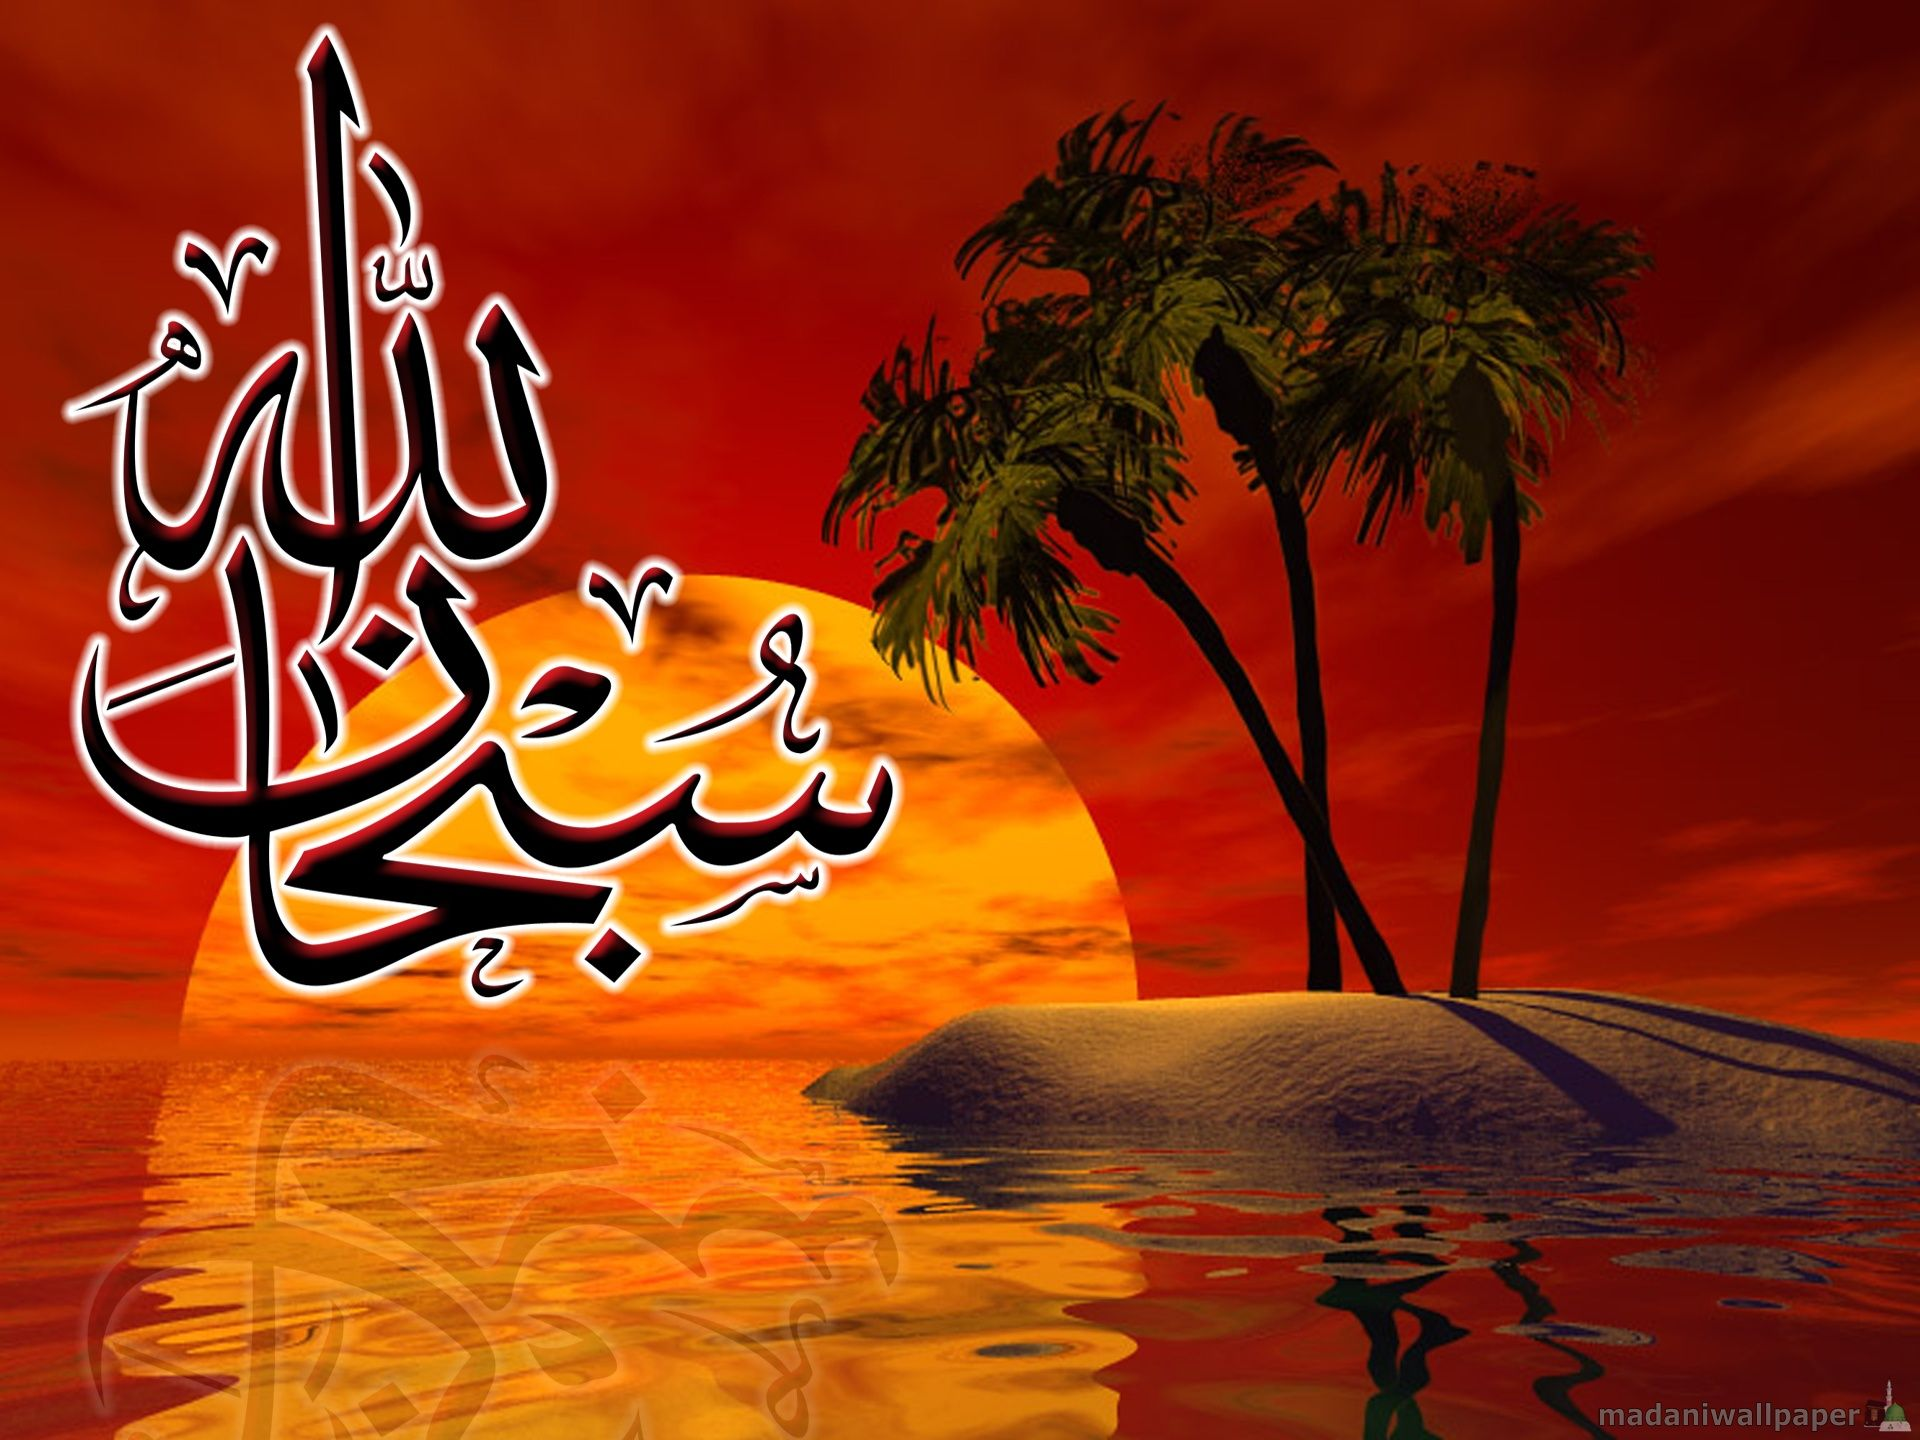 Beautiful Wallpaper Name Maryam - a20eeb96dfd5c38ac6a8129b8f38a0a4  Pic_143393.jpg